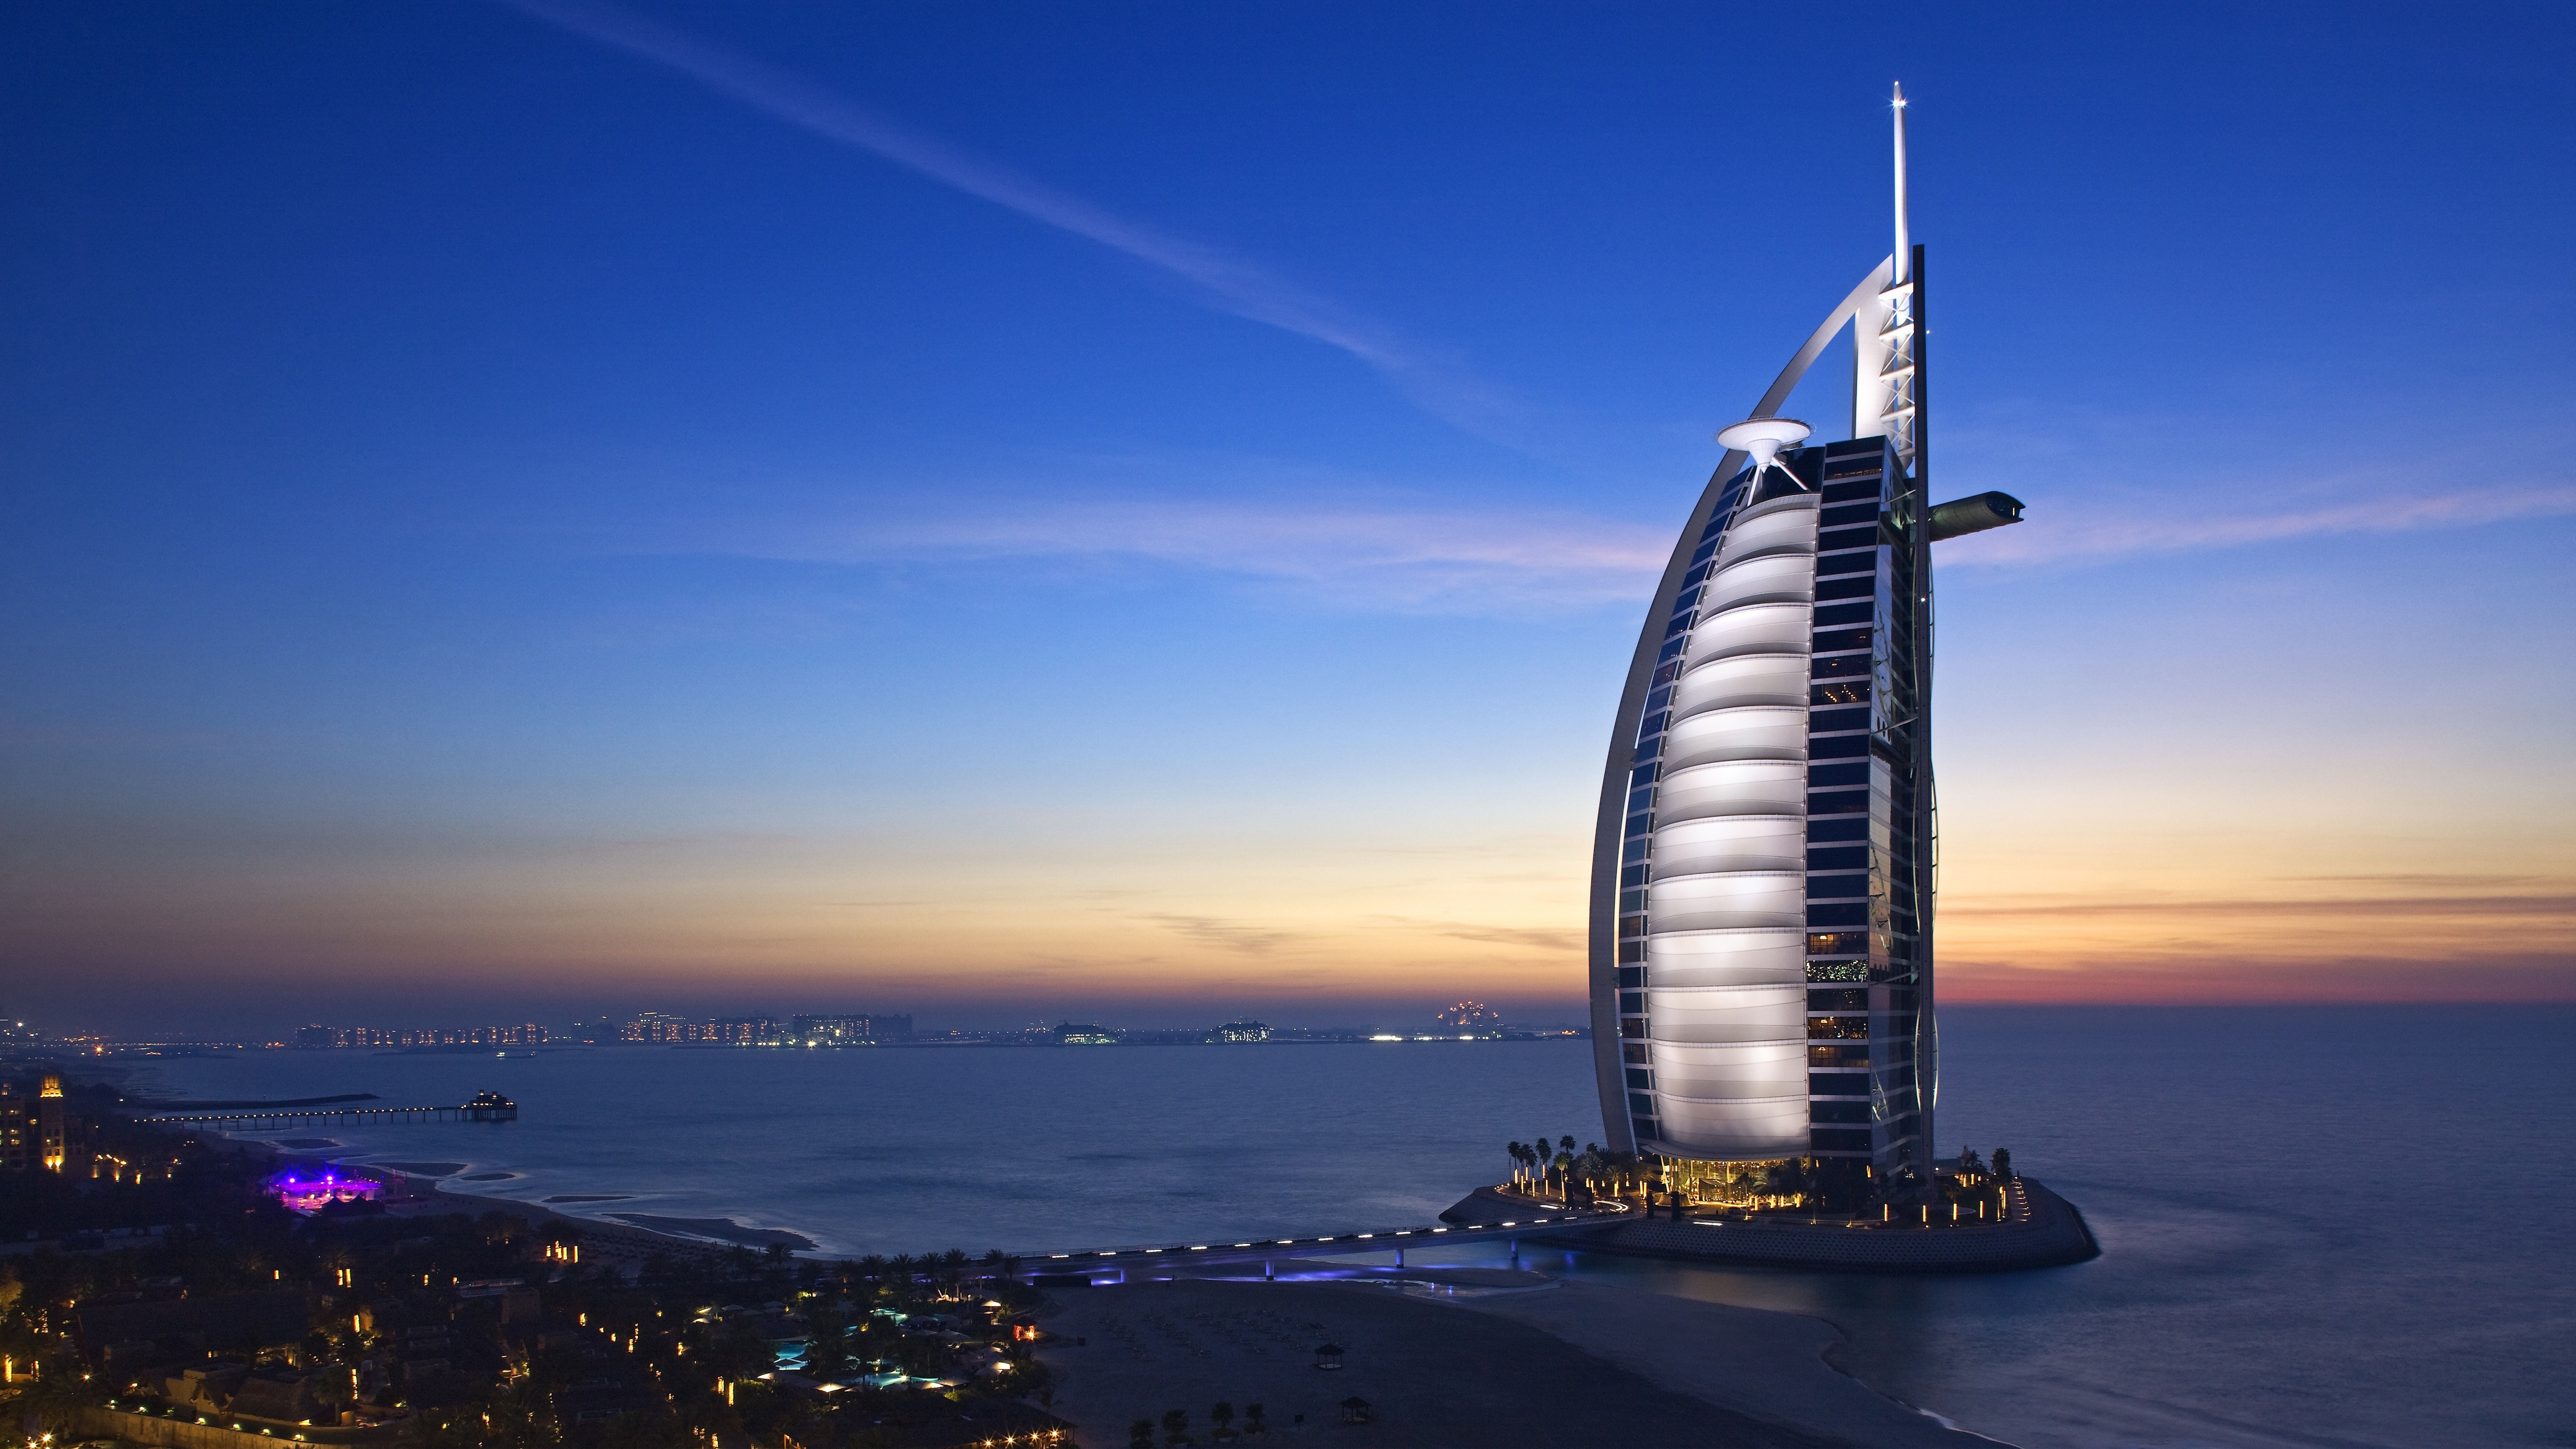 Fondos de pantalla Burj Al Arab Dubai Cities United Arab Emirates